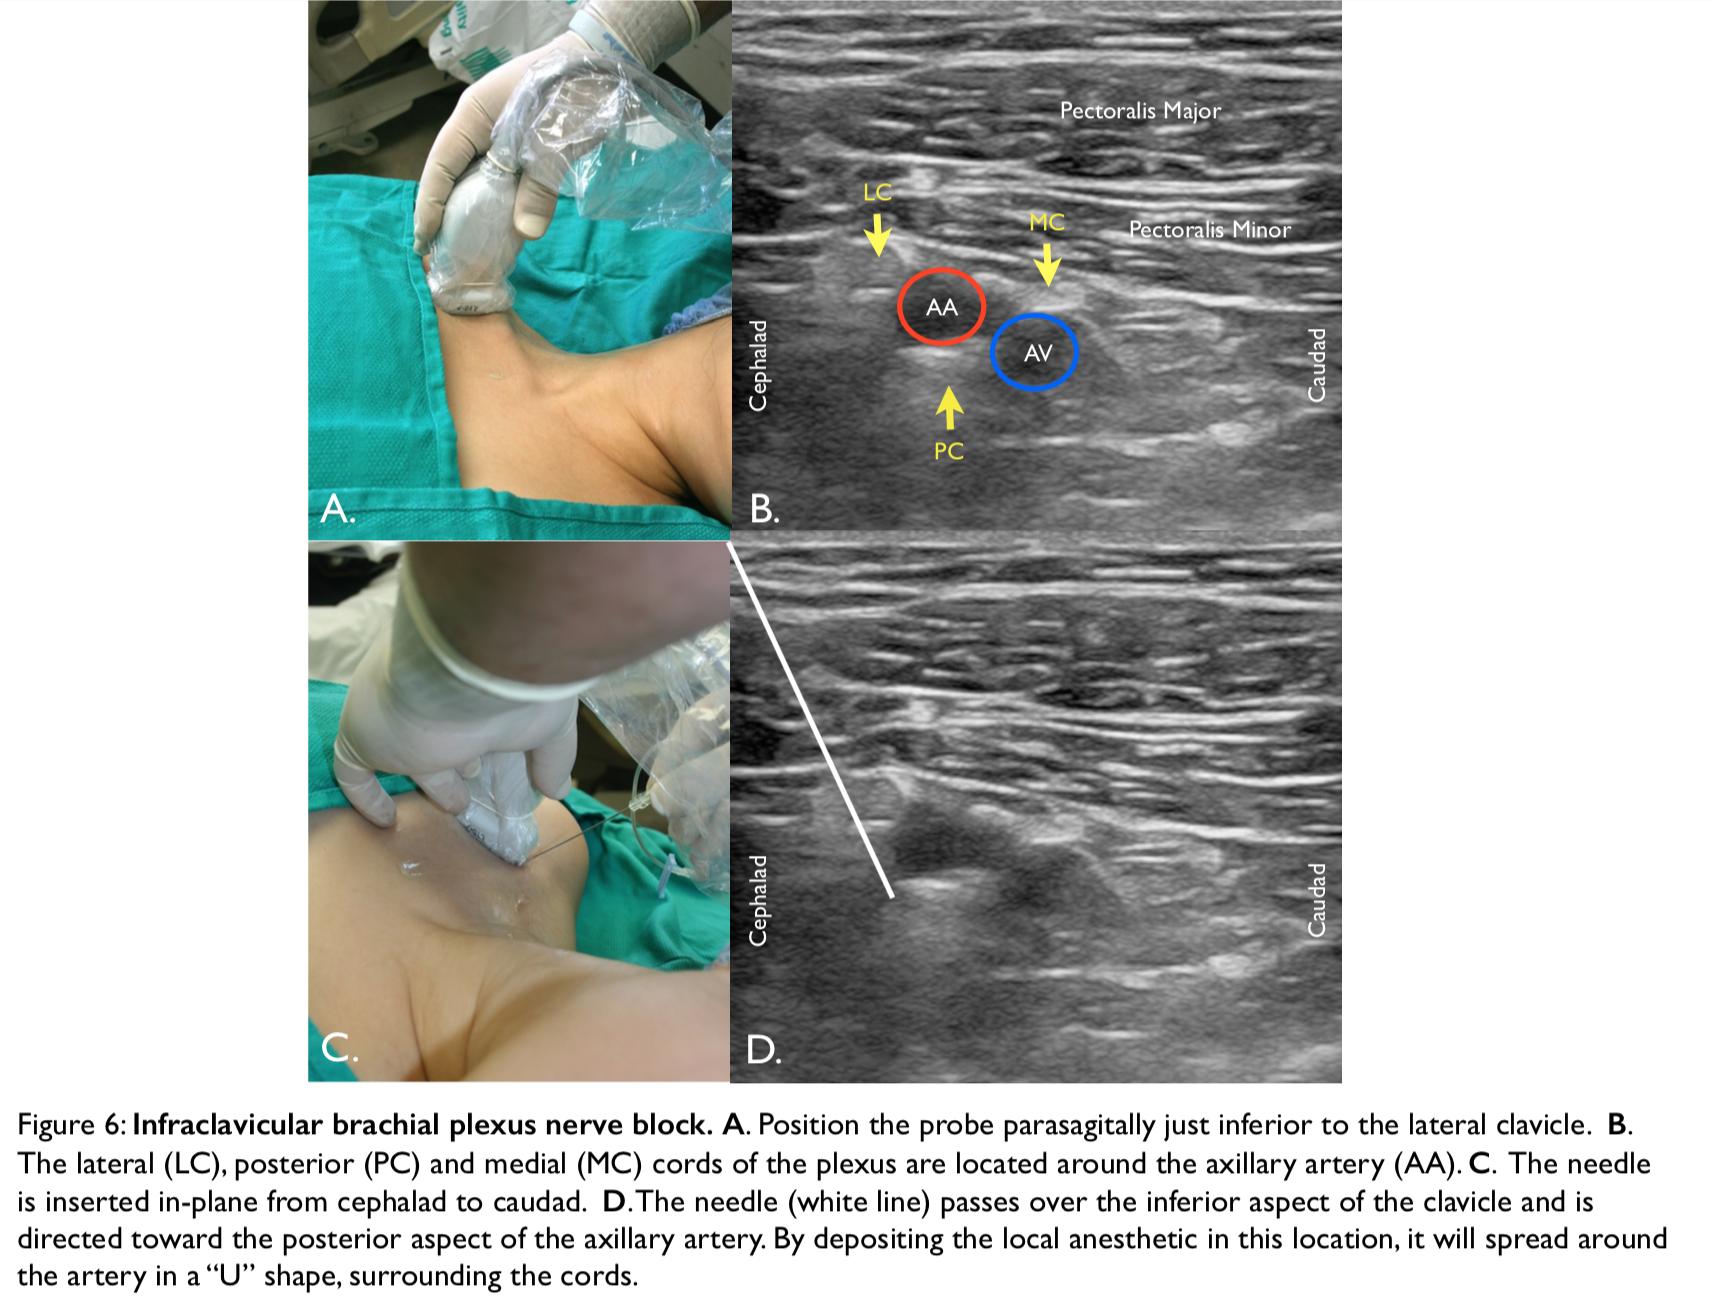 Ultrasound-Guided Regional Nerve Blocks in Emergency